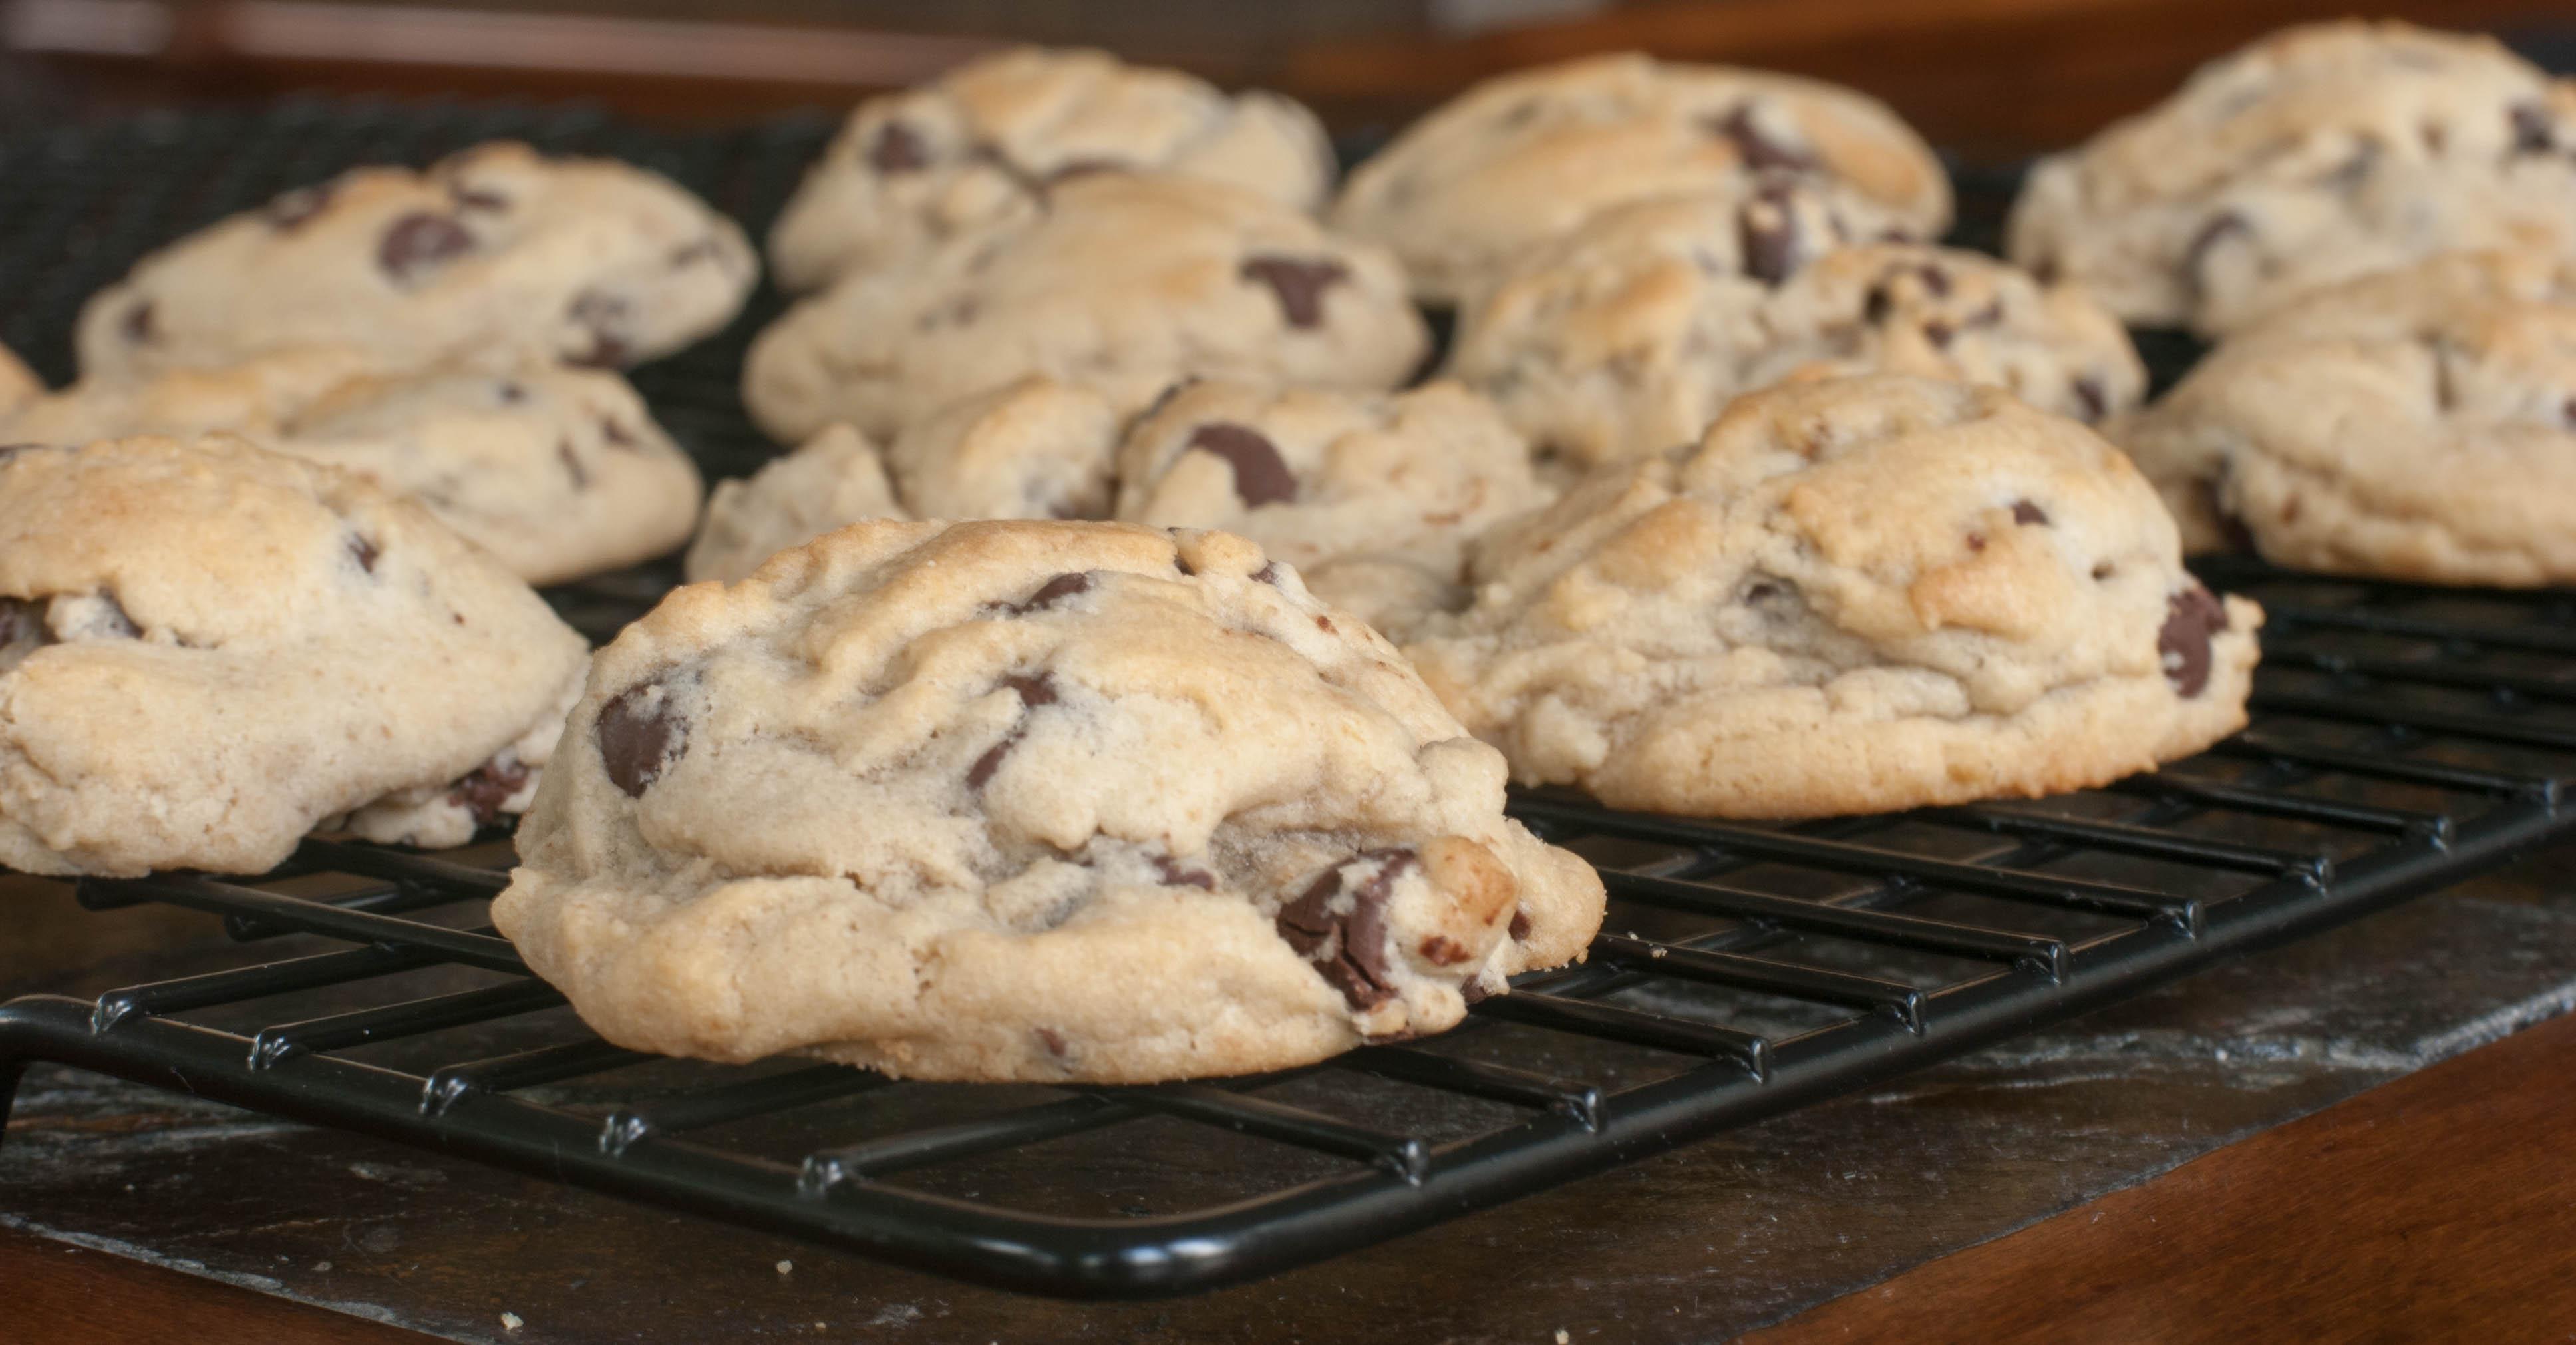 Easy Chocolate Chip Cookies - TGIF - This Grandma is Fun